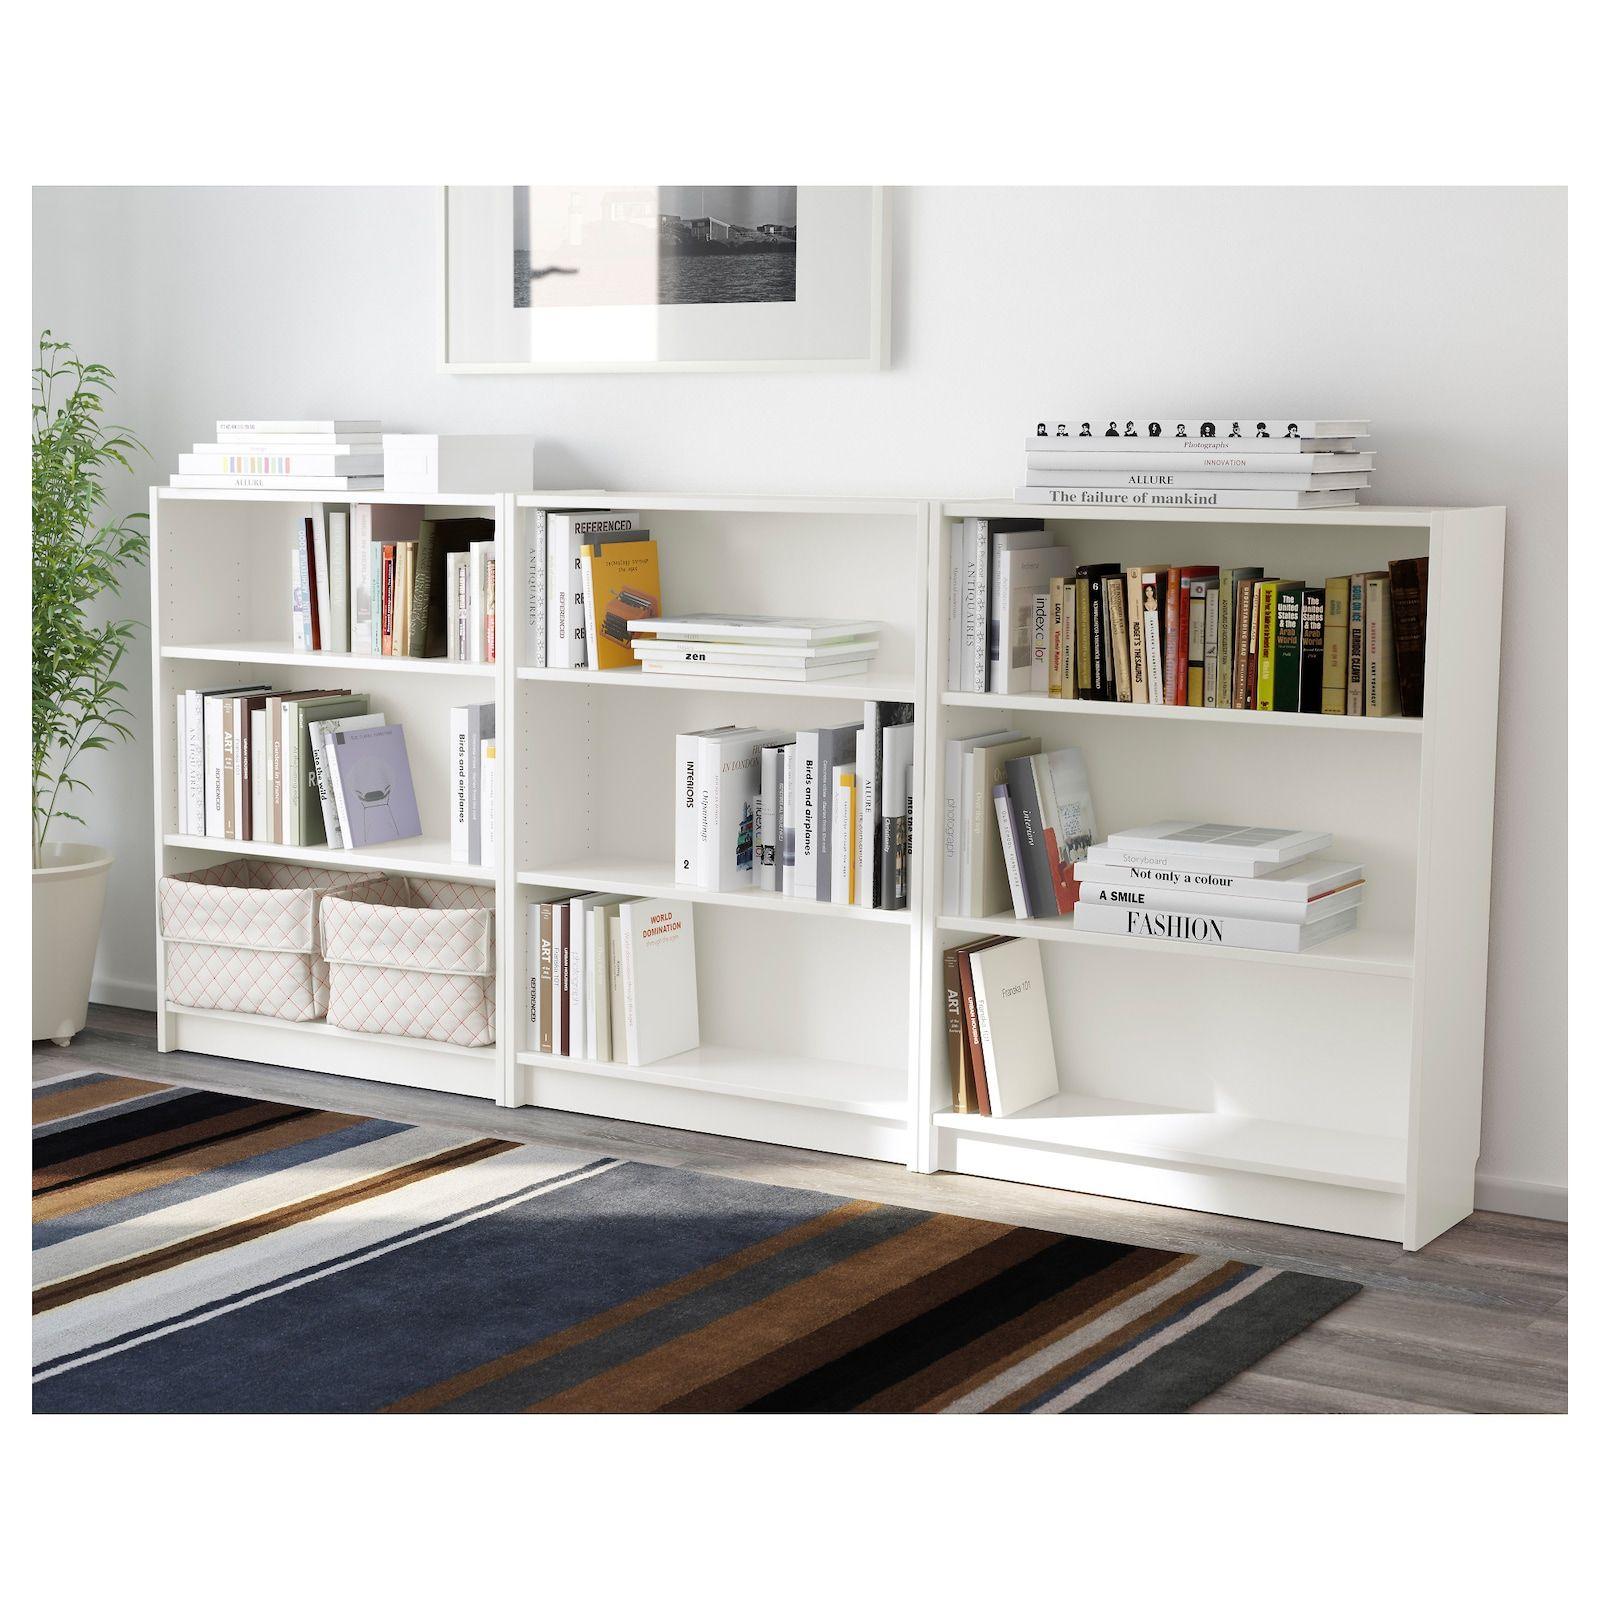 Billy Bibliotheque Blanc 240x28x106 Cm Ikea In 2020 White Bookcase Low Bookcase Ikea Bookcase